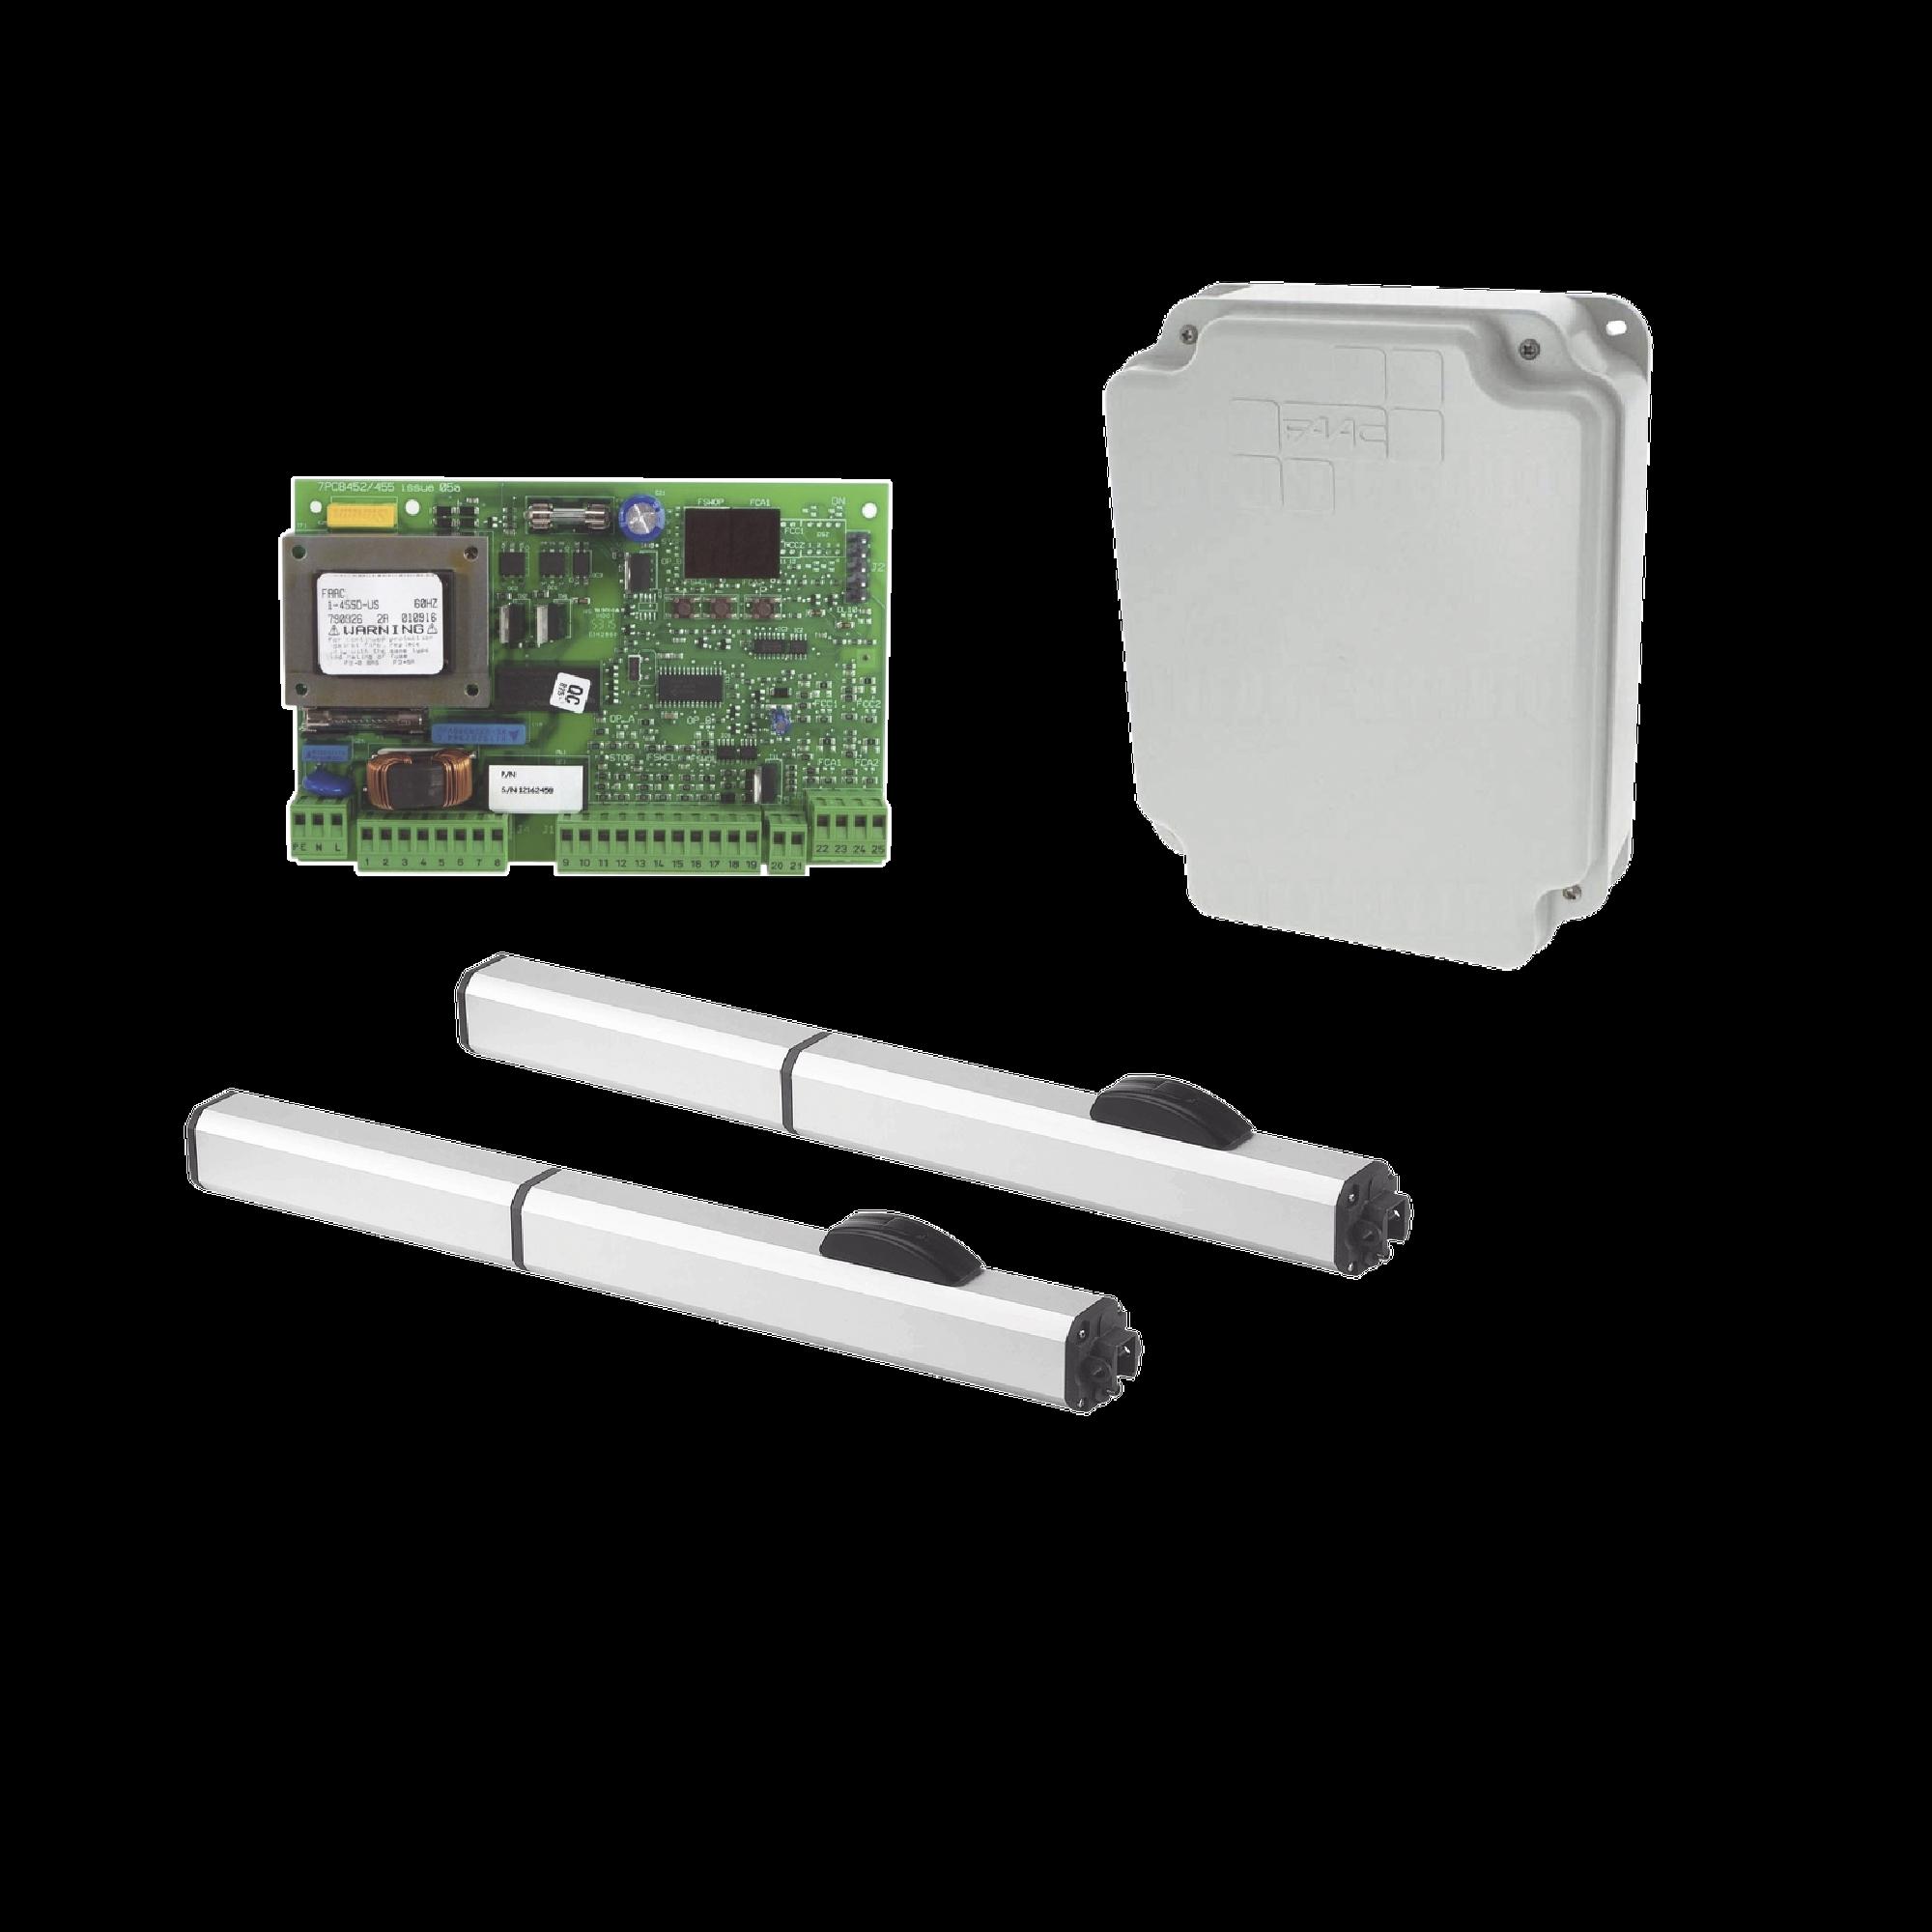 Kit de Operadores Hidráulicos Para Uso Continuo FAAC 400 CBACL